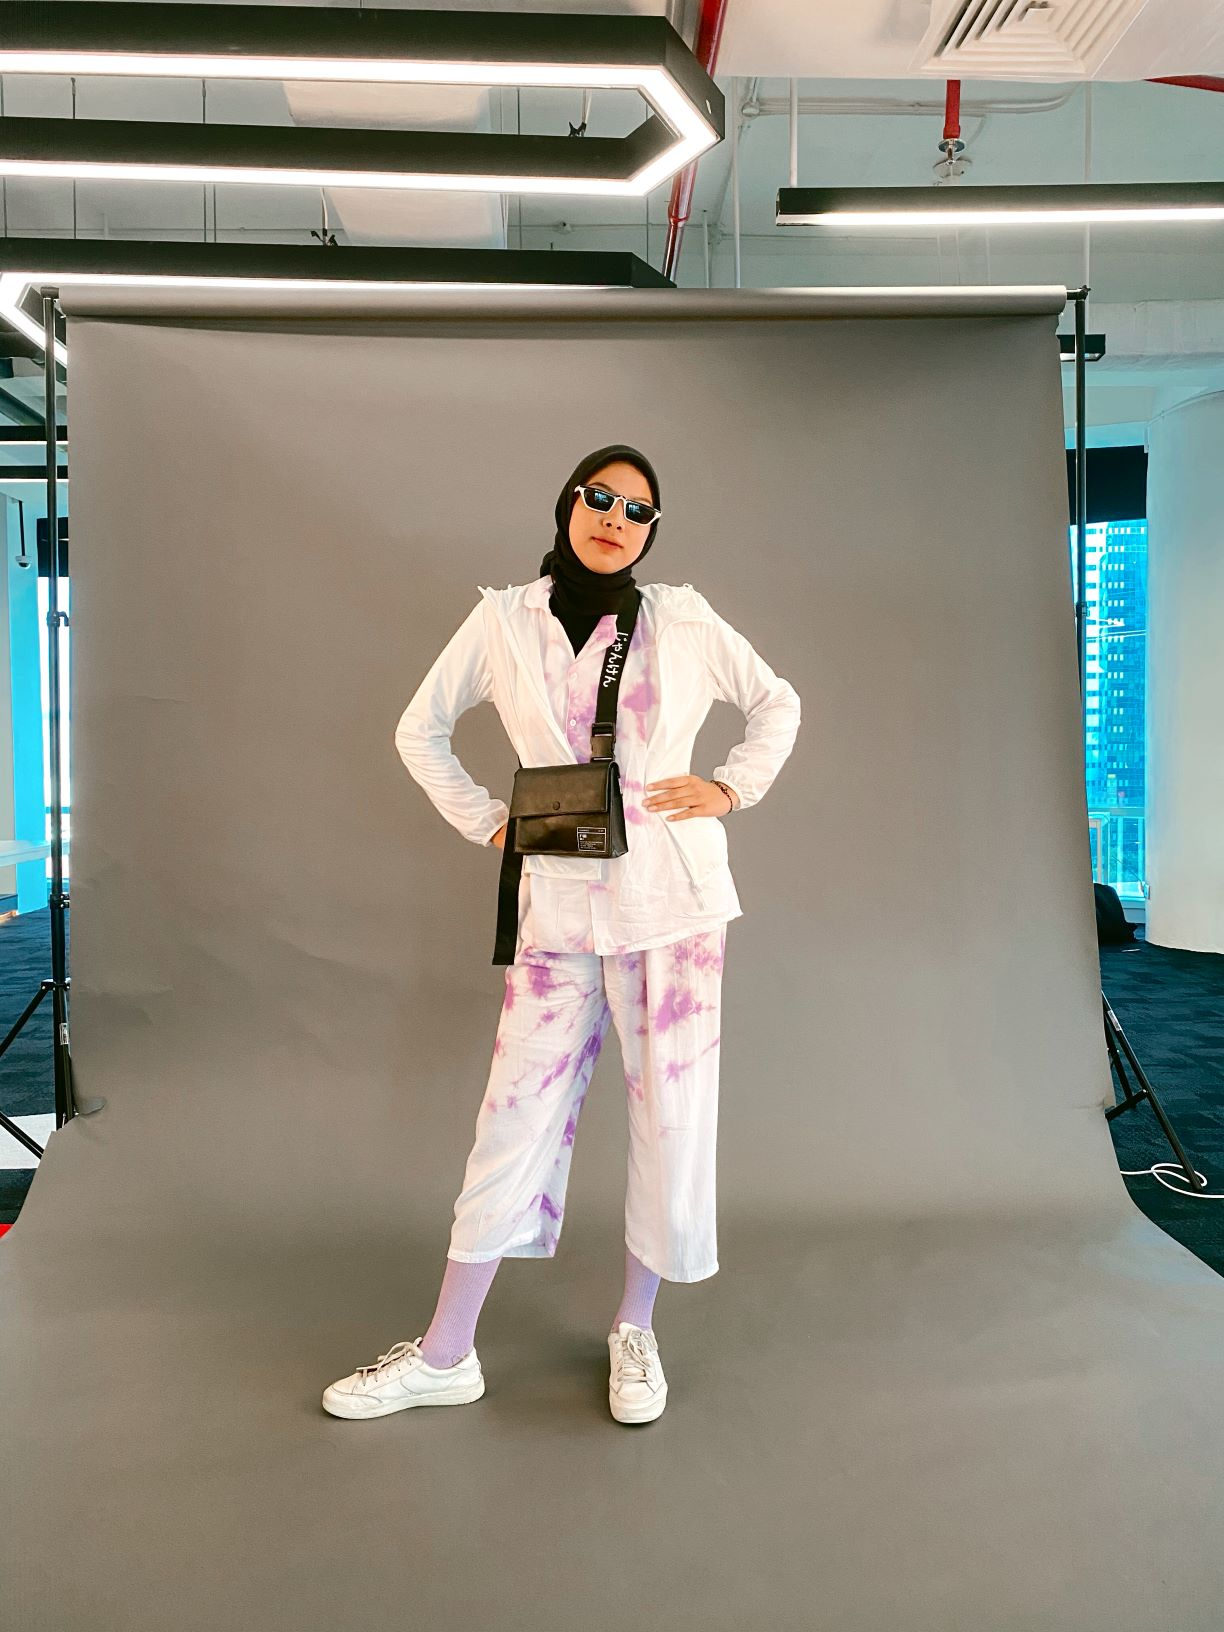 Steal The Look: Gaya Tie-dye ala Gigi Hadid